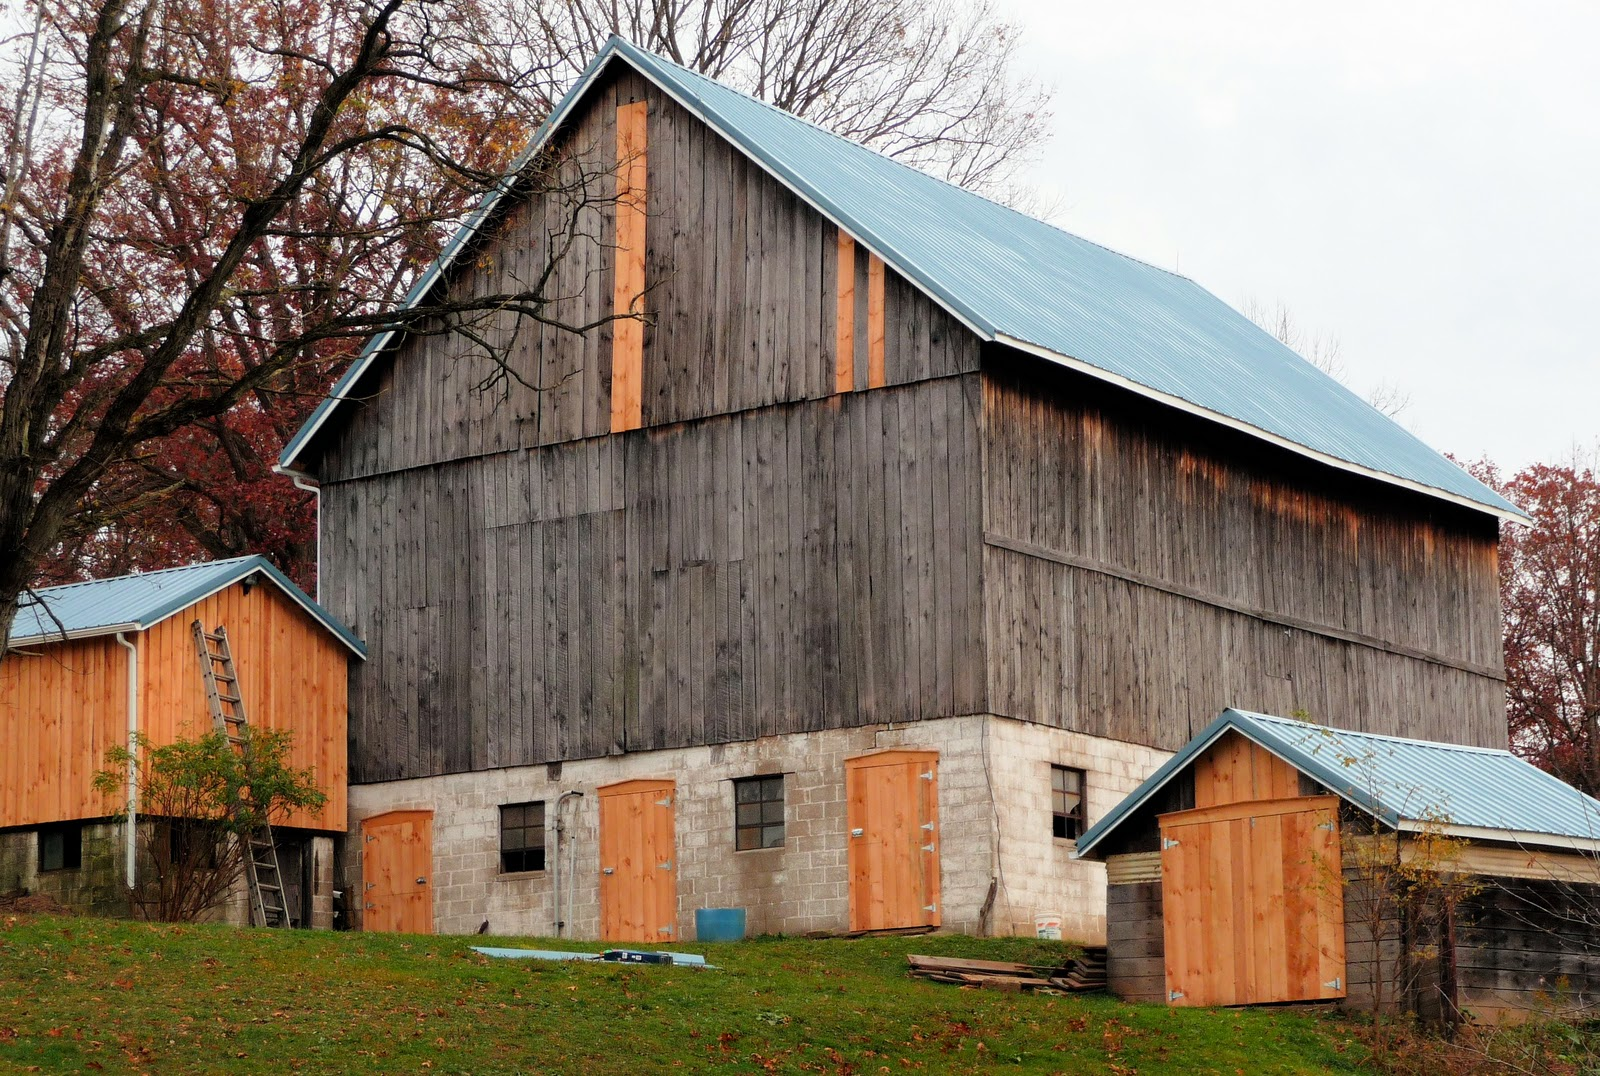 Wild rose farm barn renovation for Barn renovation